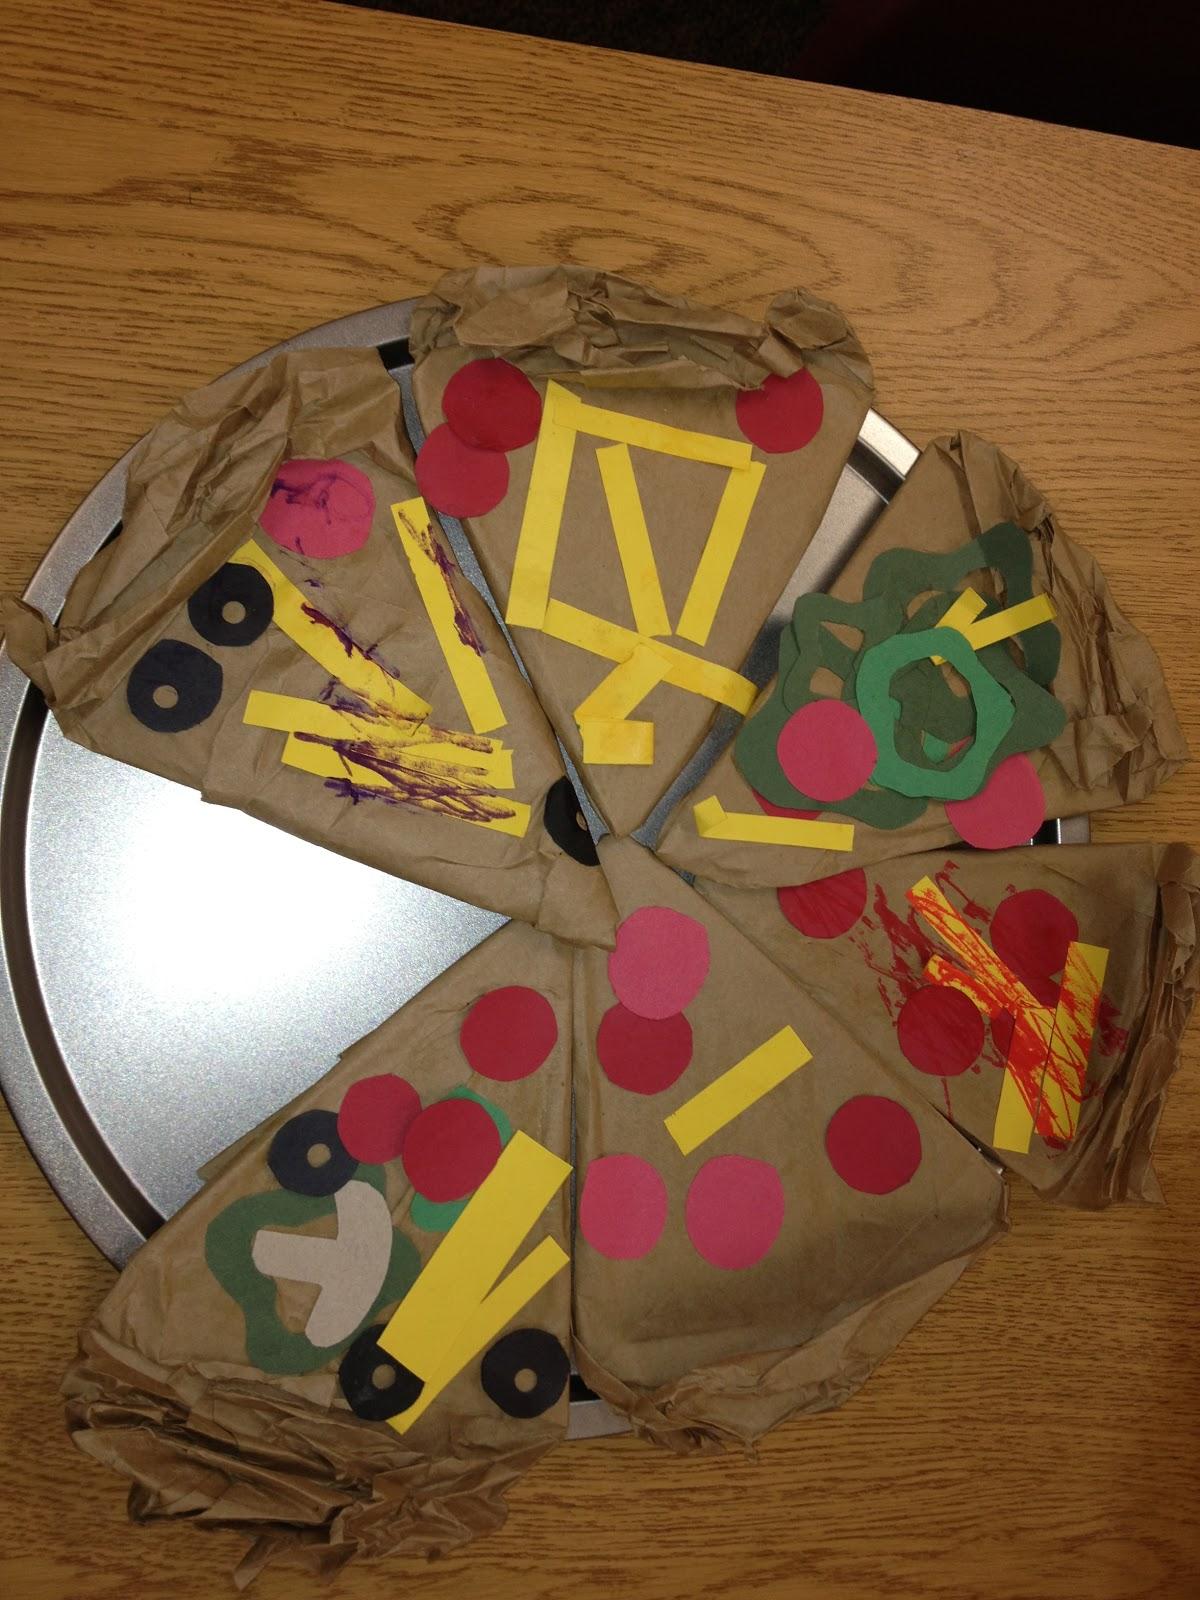 Coyne S Crazy Fun Preschool Classroom Pizza Party